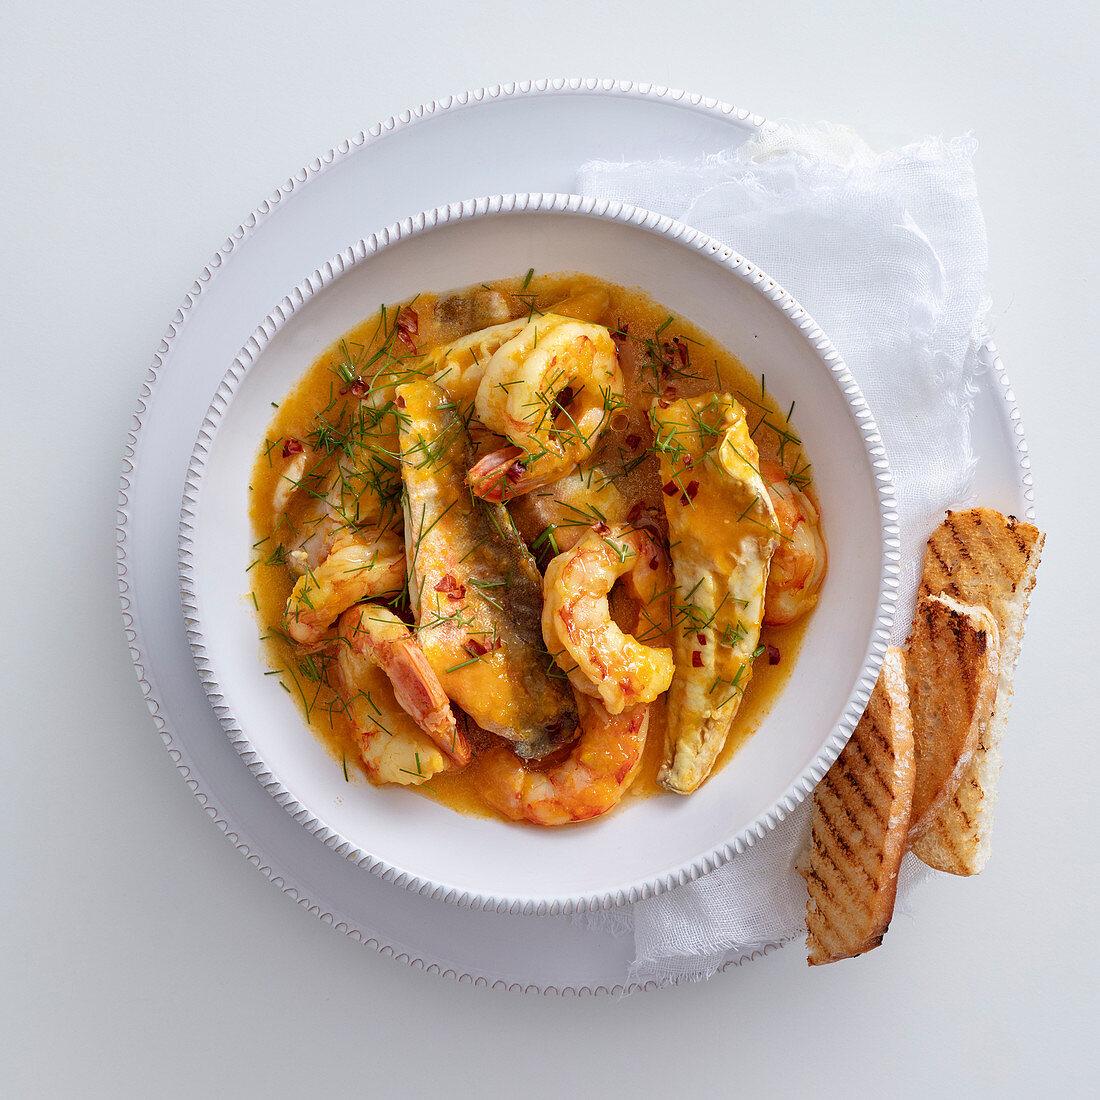 Gurnard with shrimp, fennel and saffron